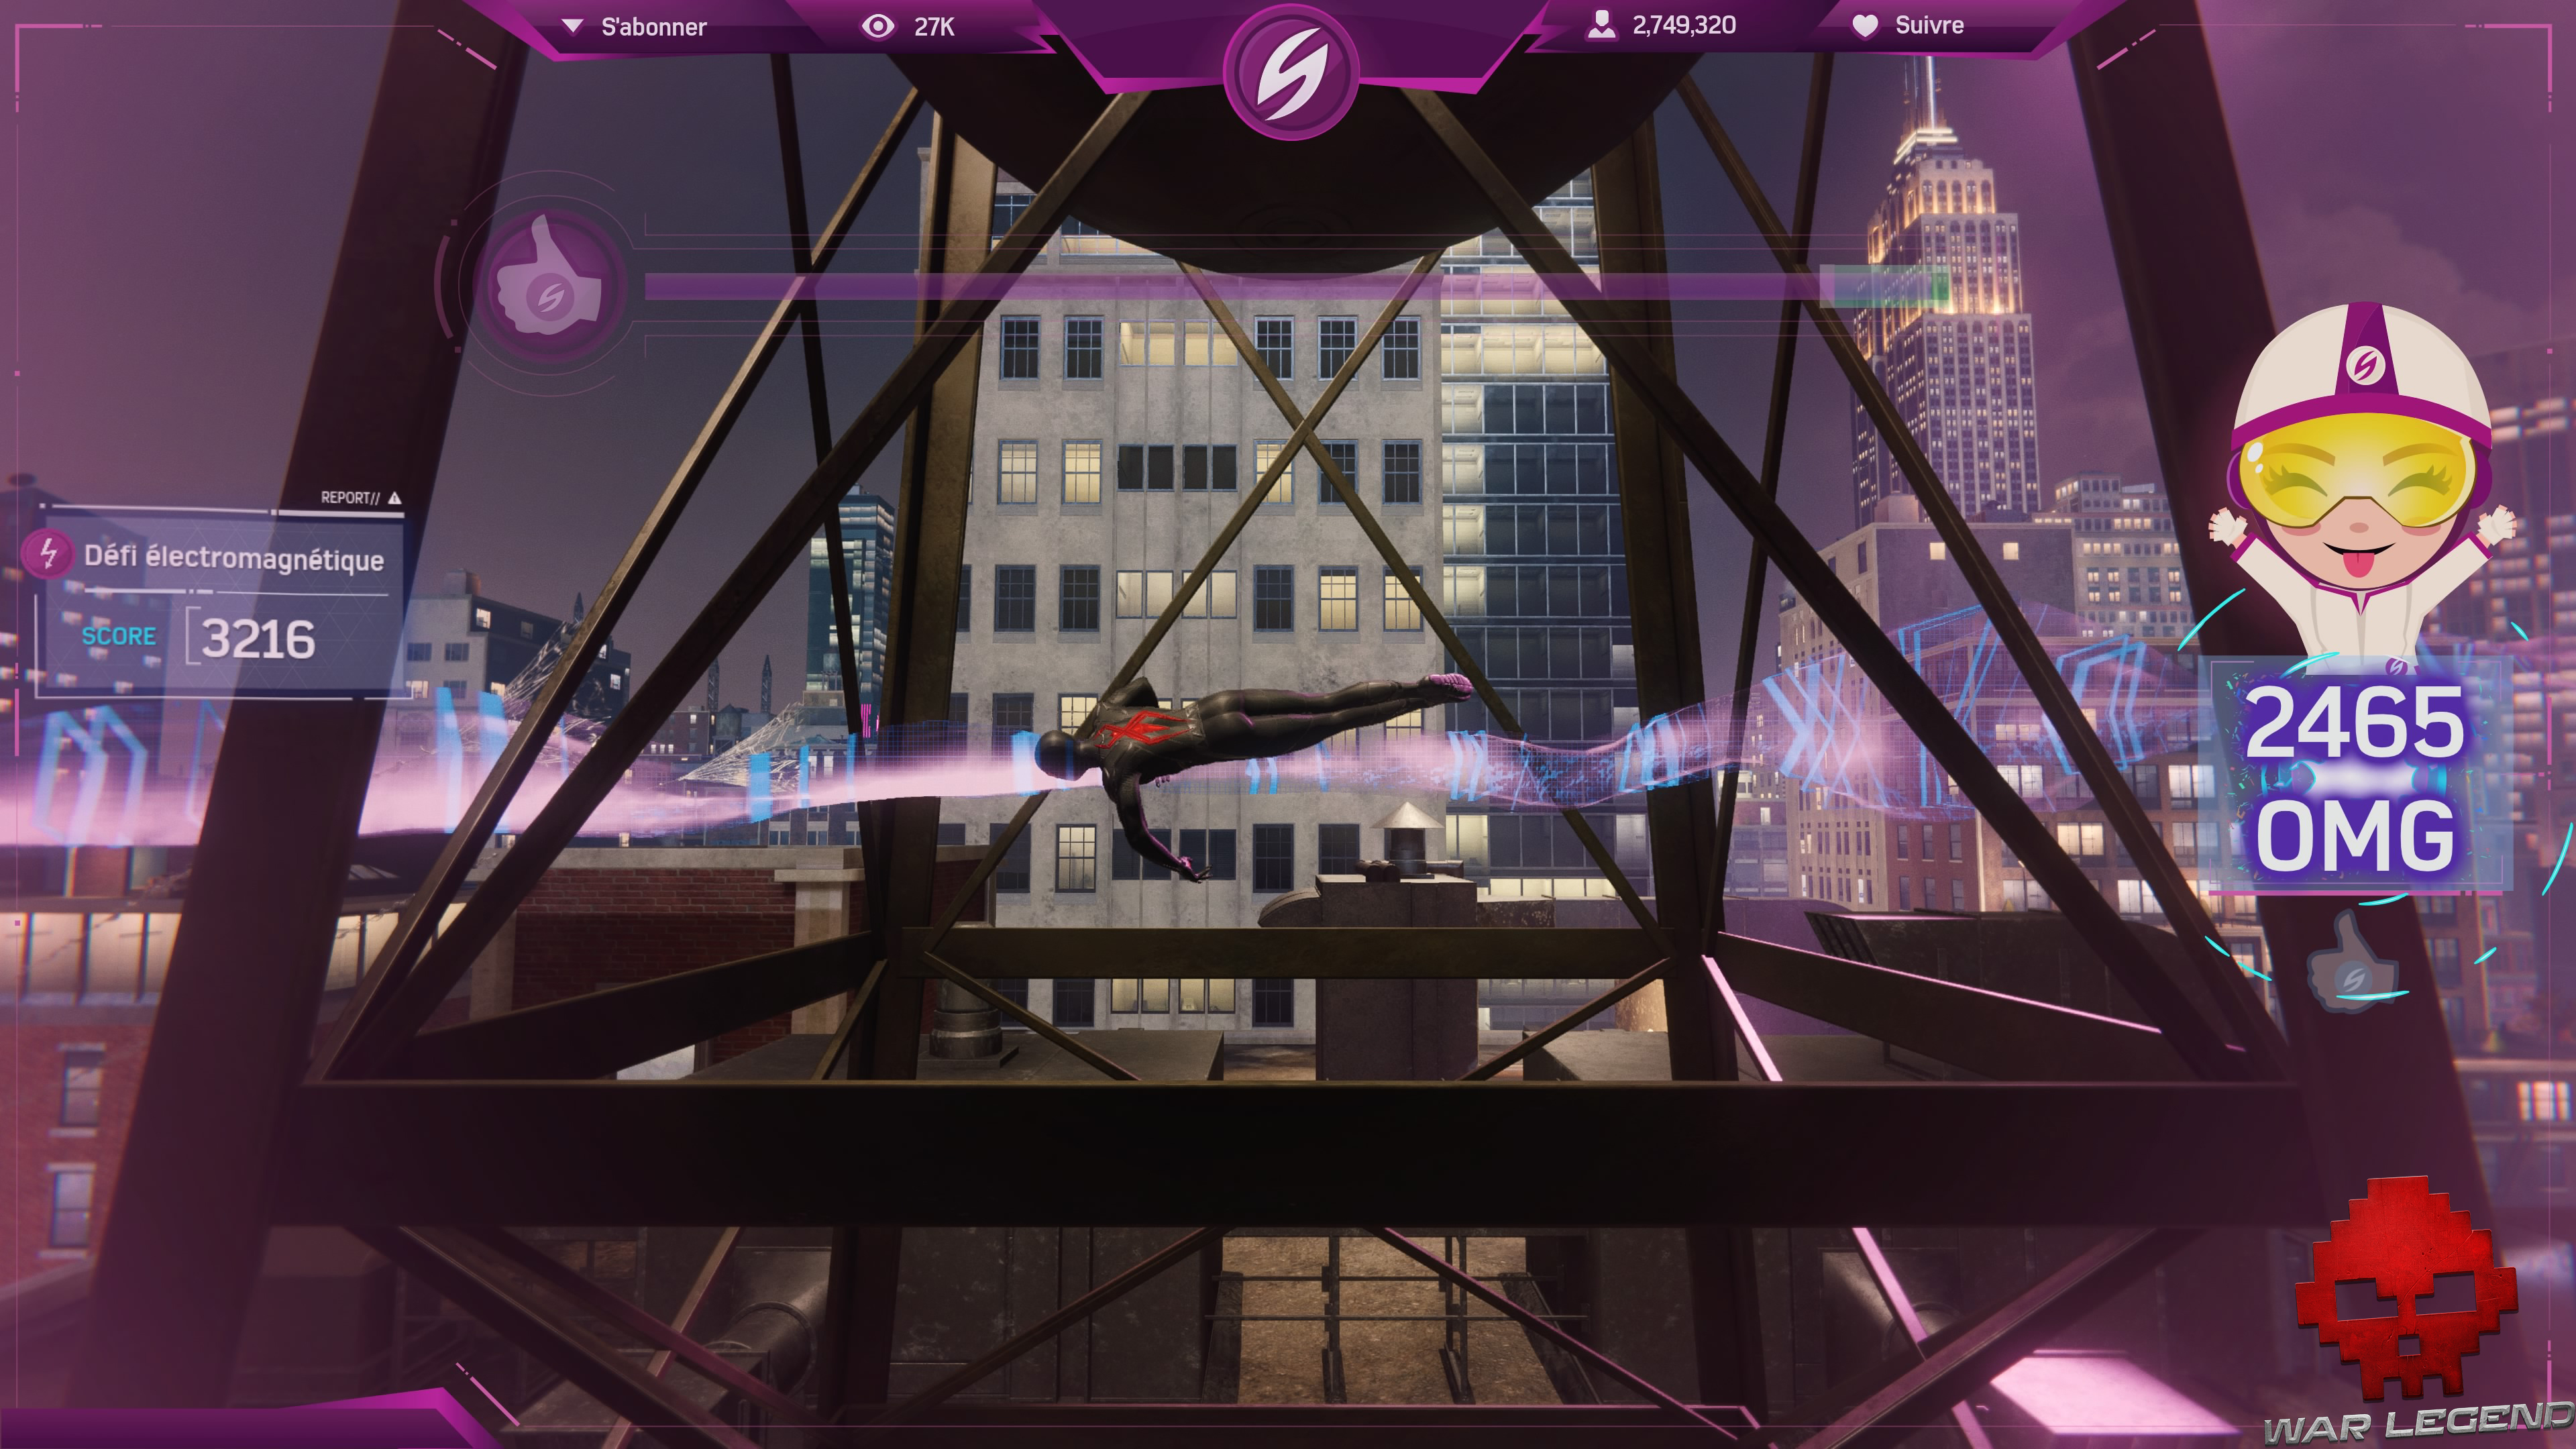 Test Spider-Man: Le Casse photo avec jauge OMG